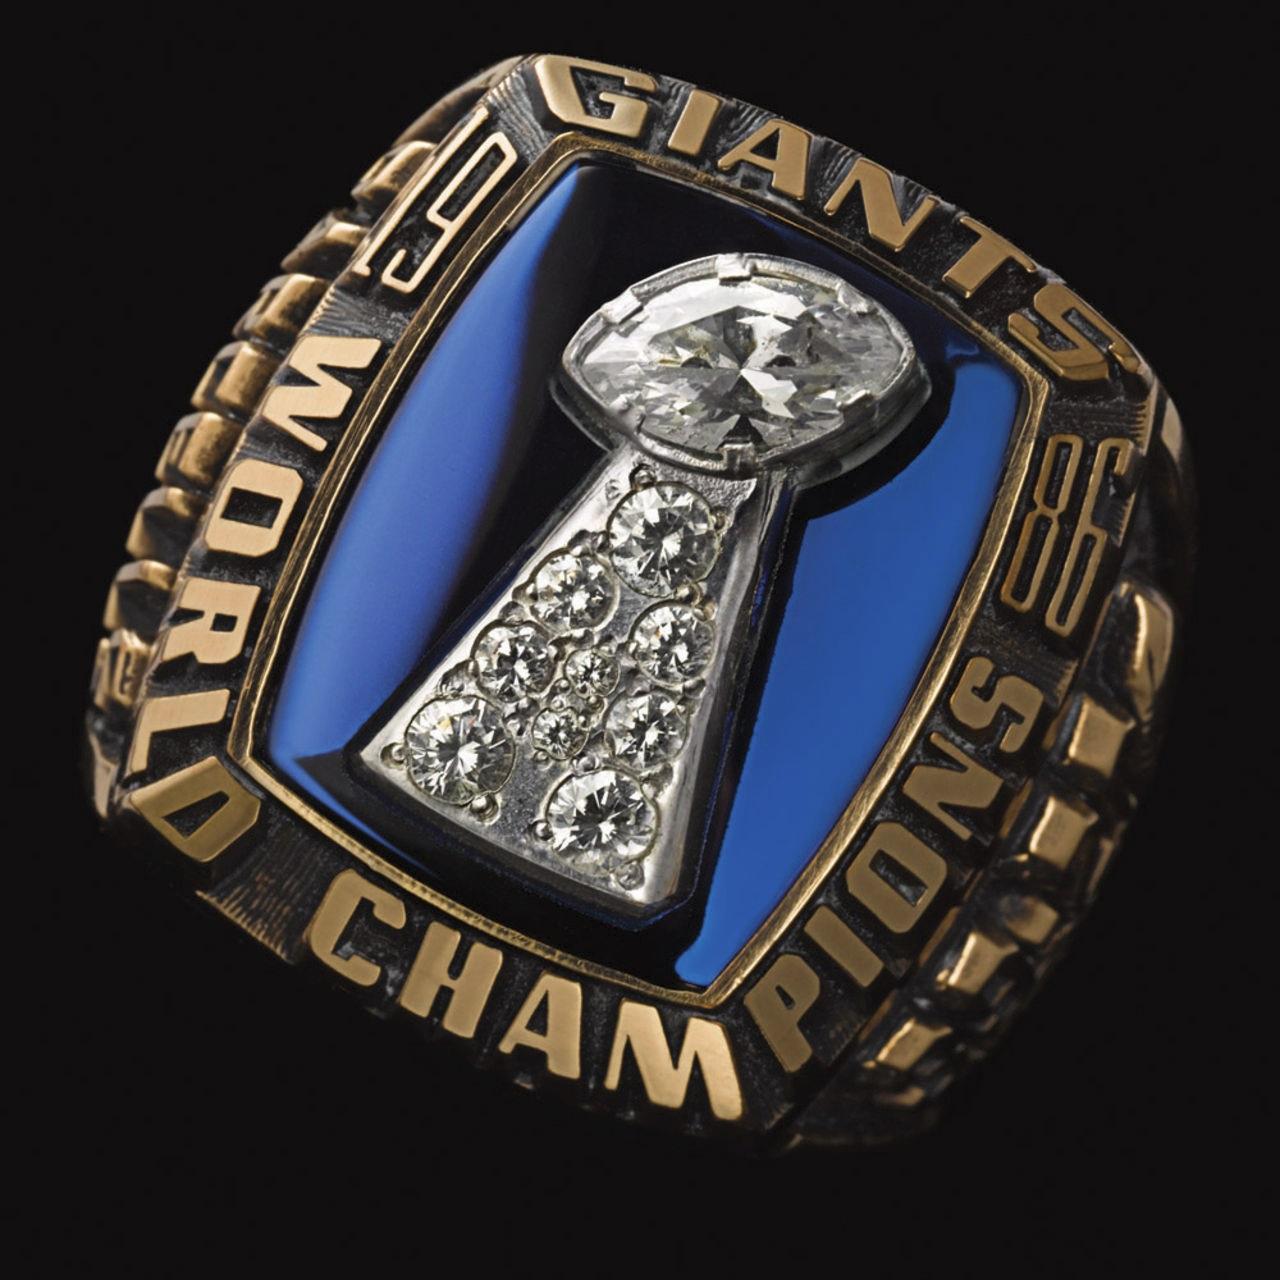 New York Giants 1987 champions ring